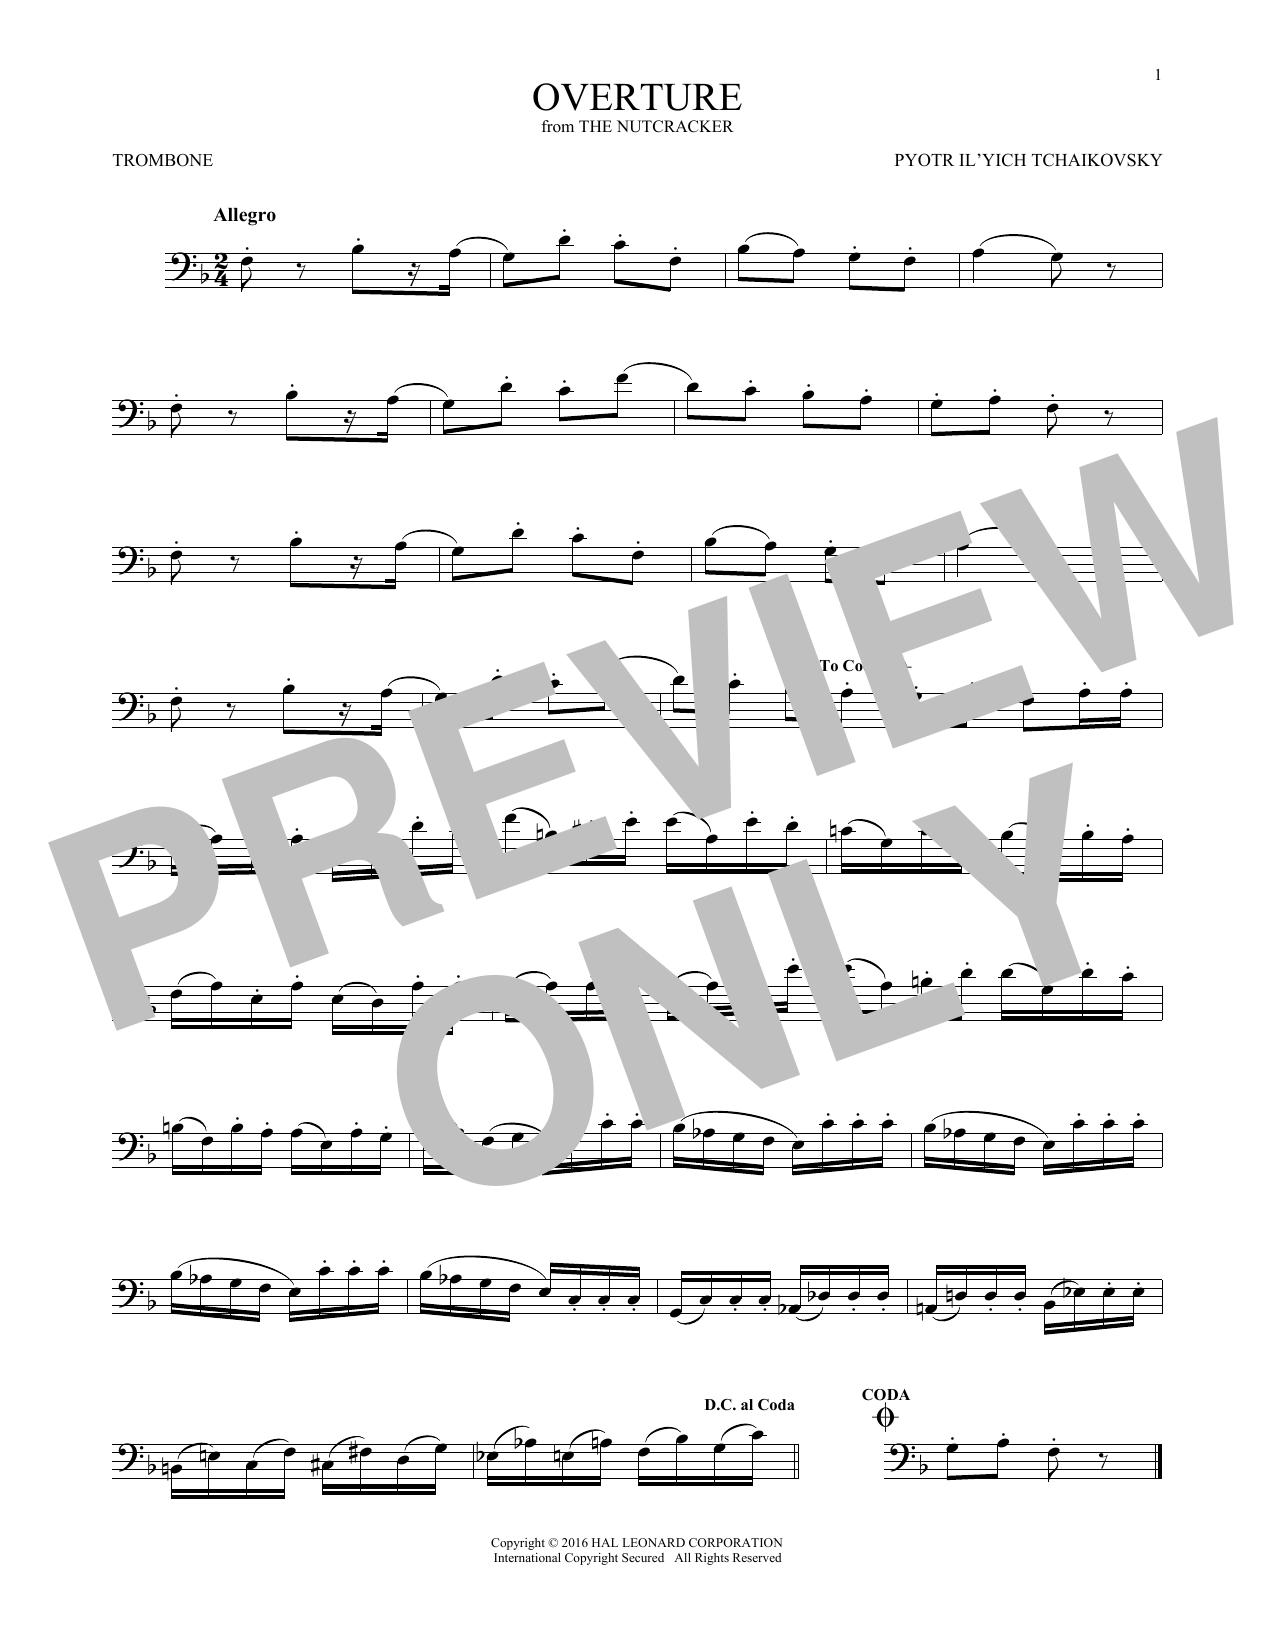 Overture (Trombone Solo)